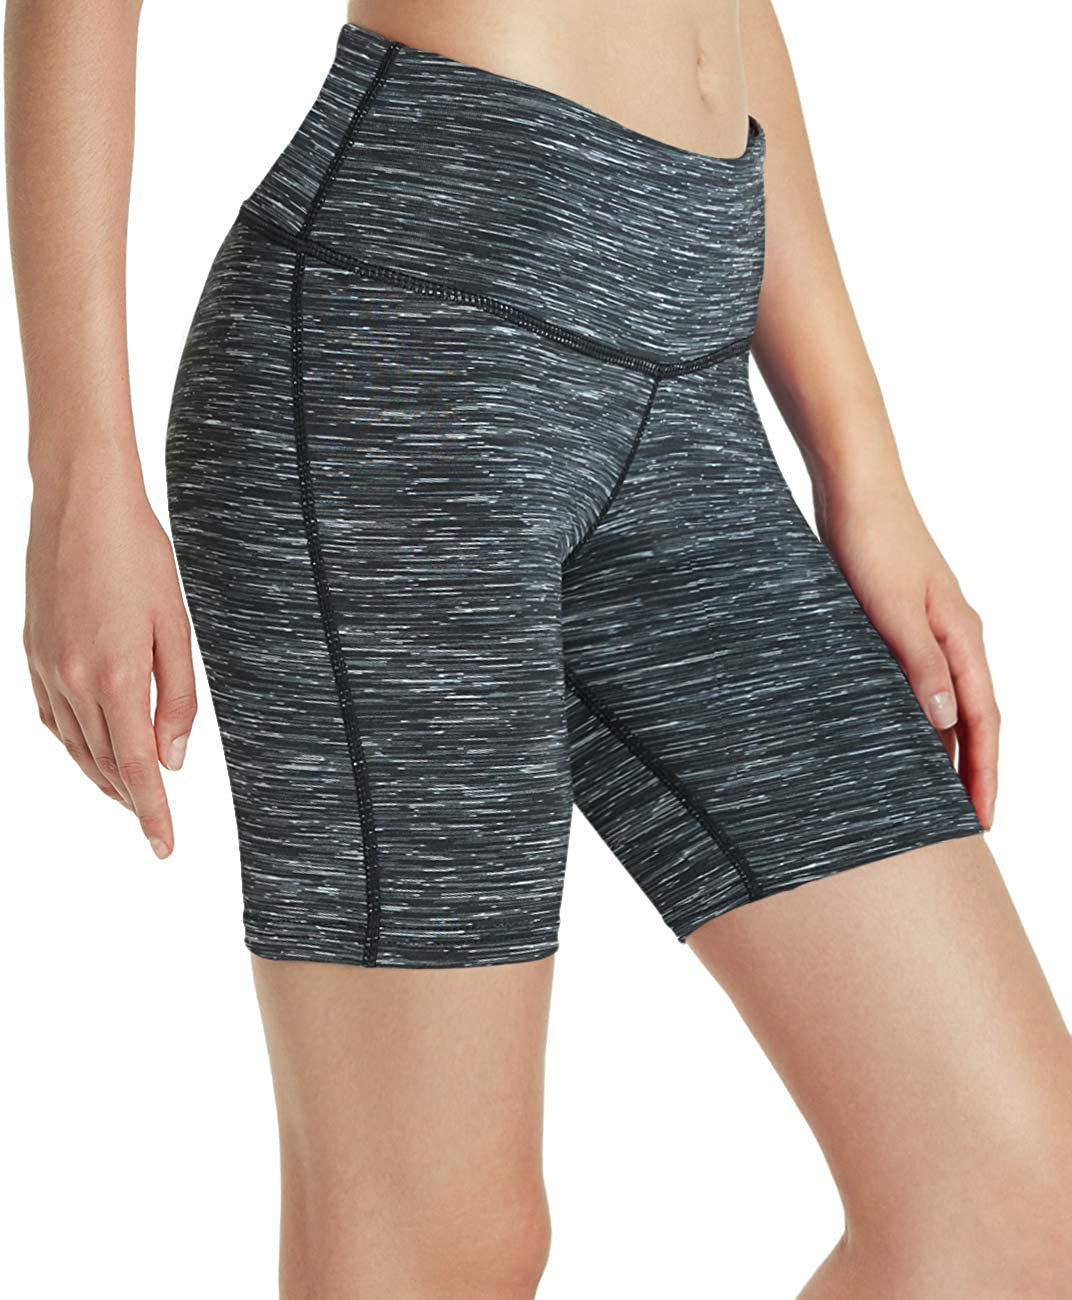 Amazon.com: Leggings Depot Womens Fashion Biker Workout